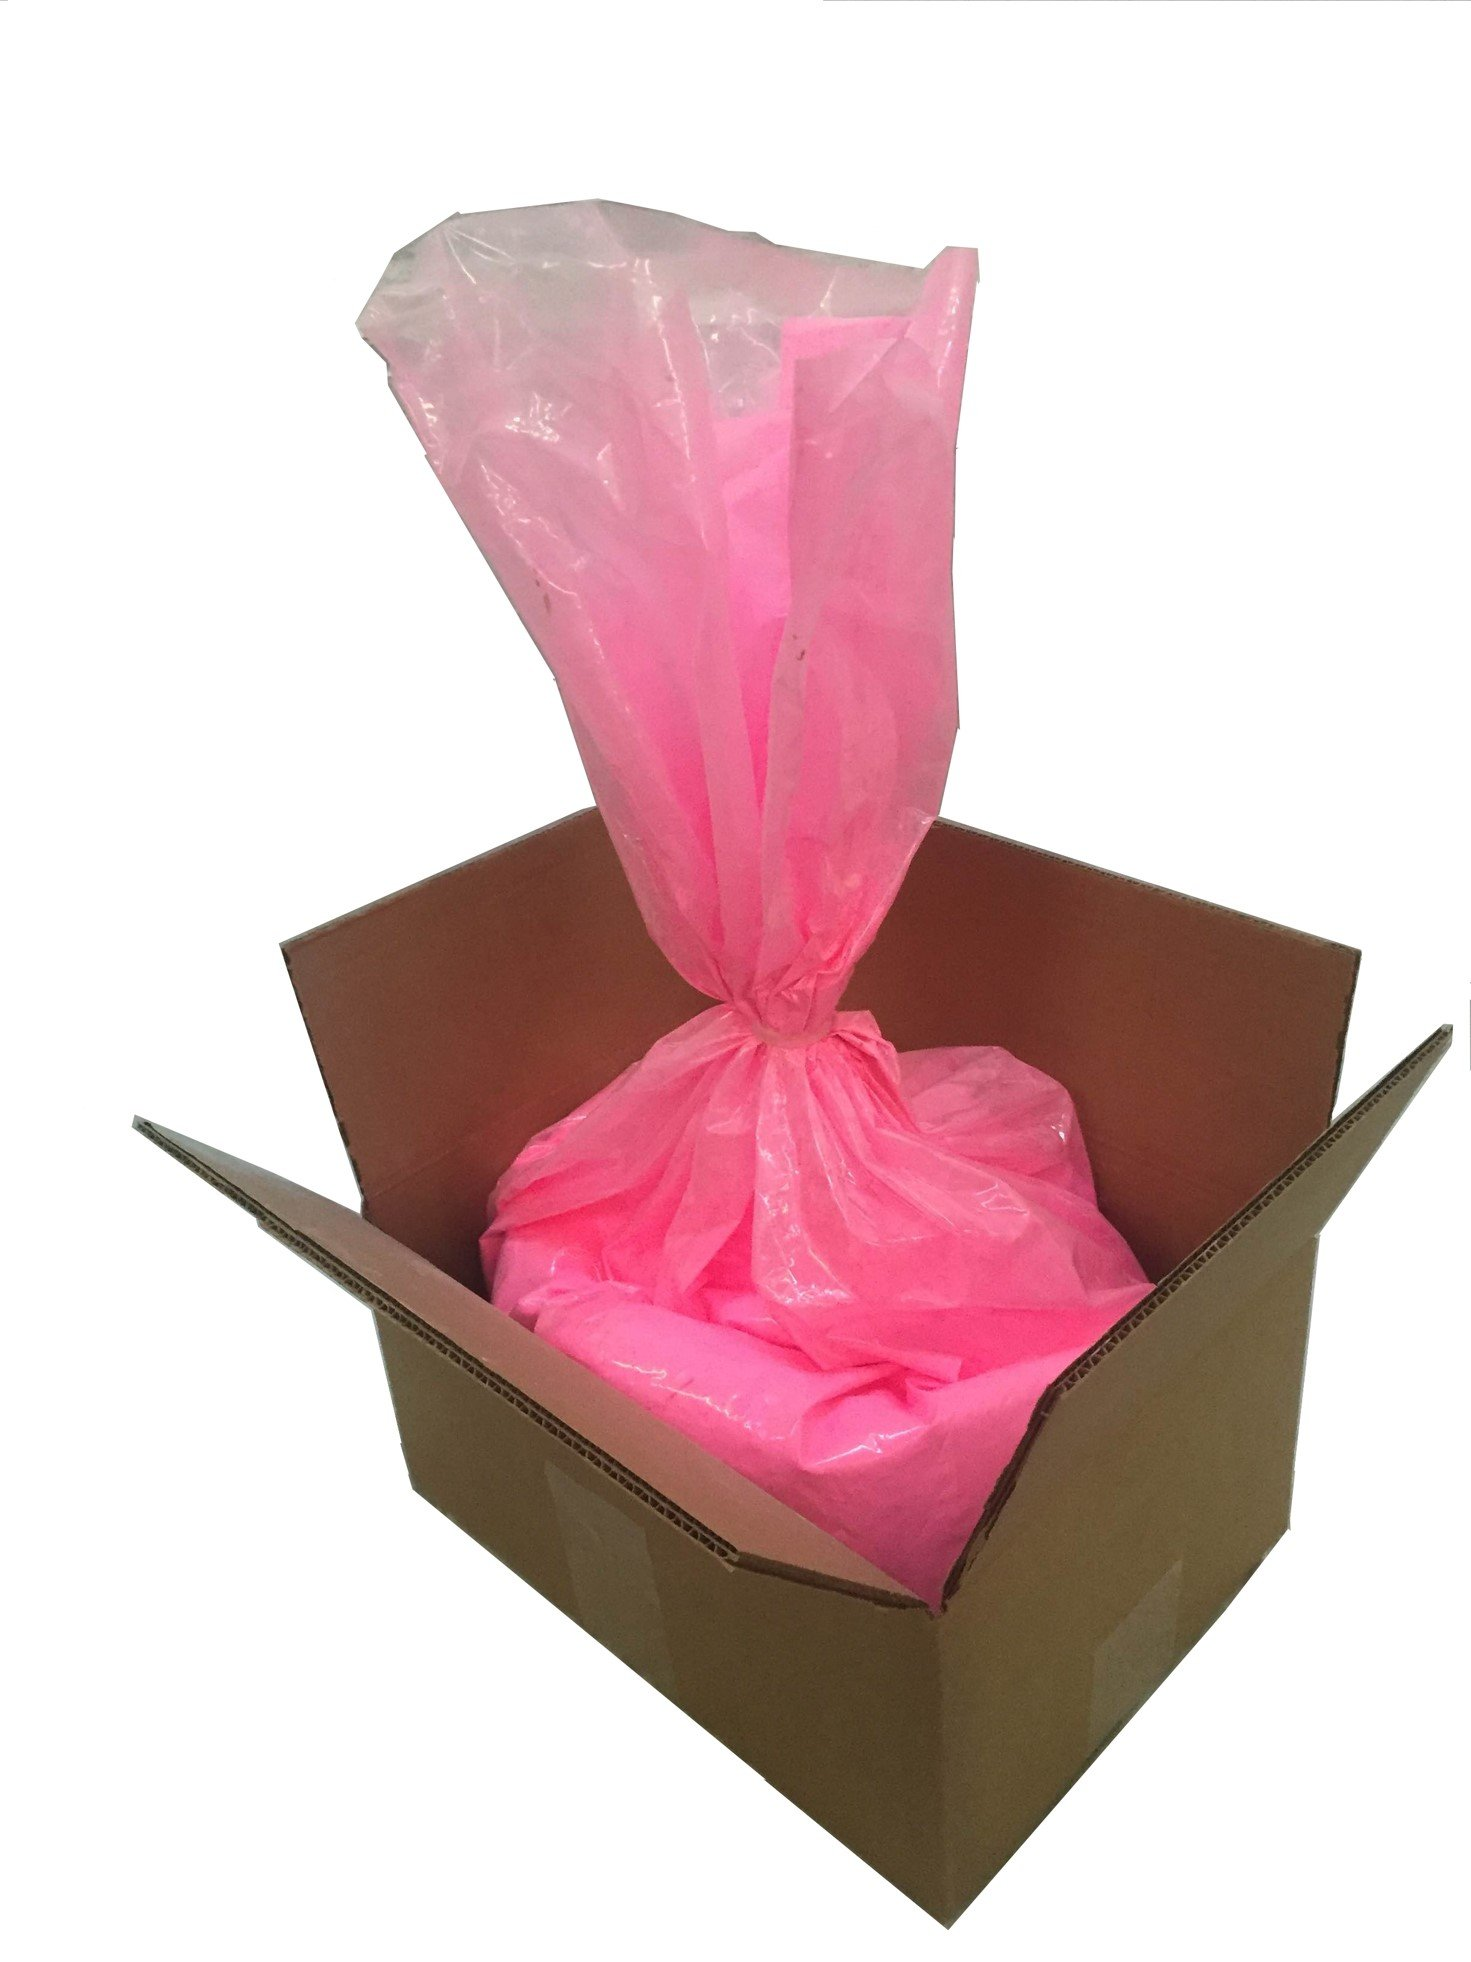 Holi Color Powder | Celebration Powder | Neon/Afterdark Pink | Bulk 25 lbs.